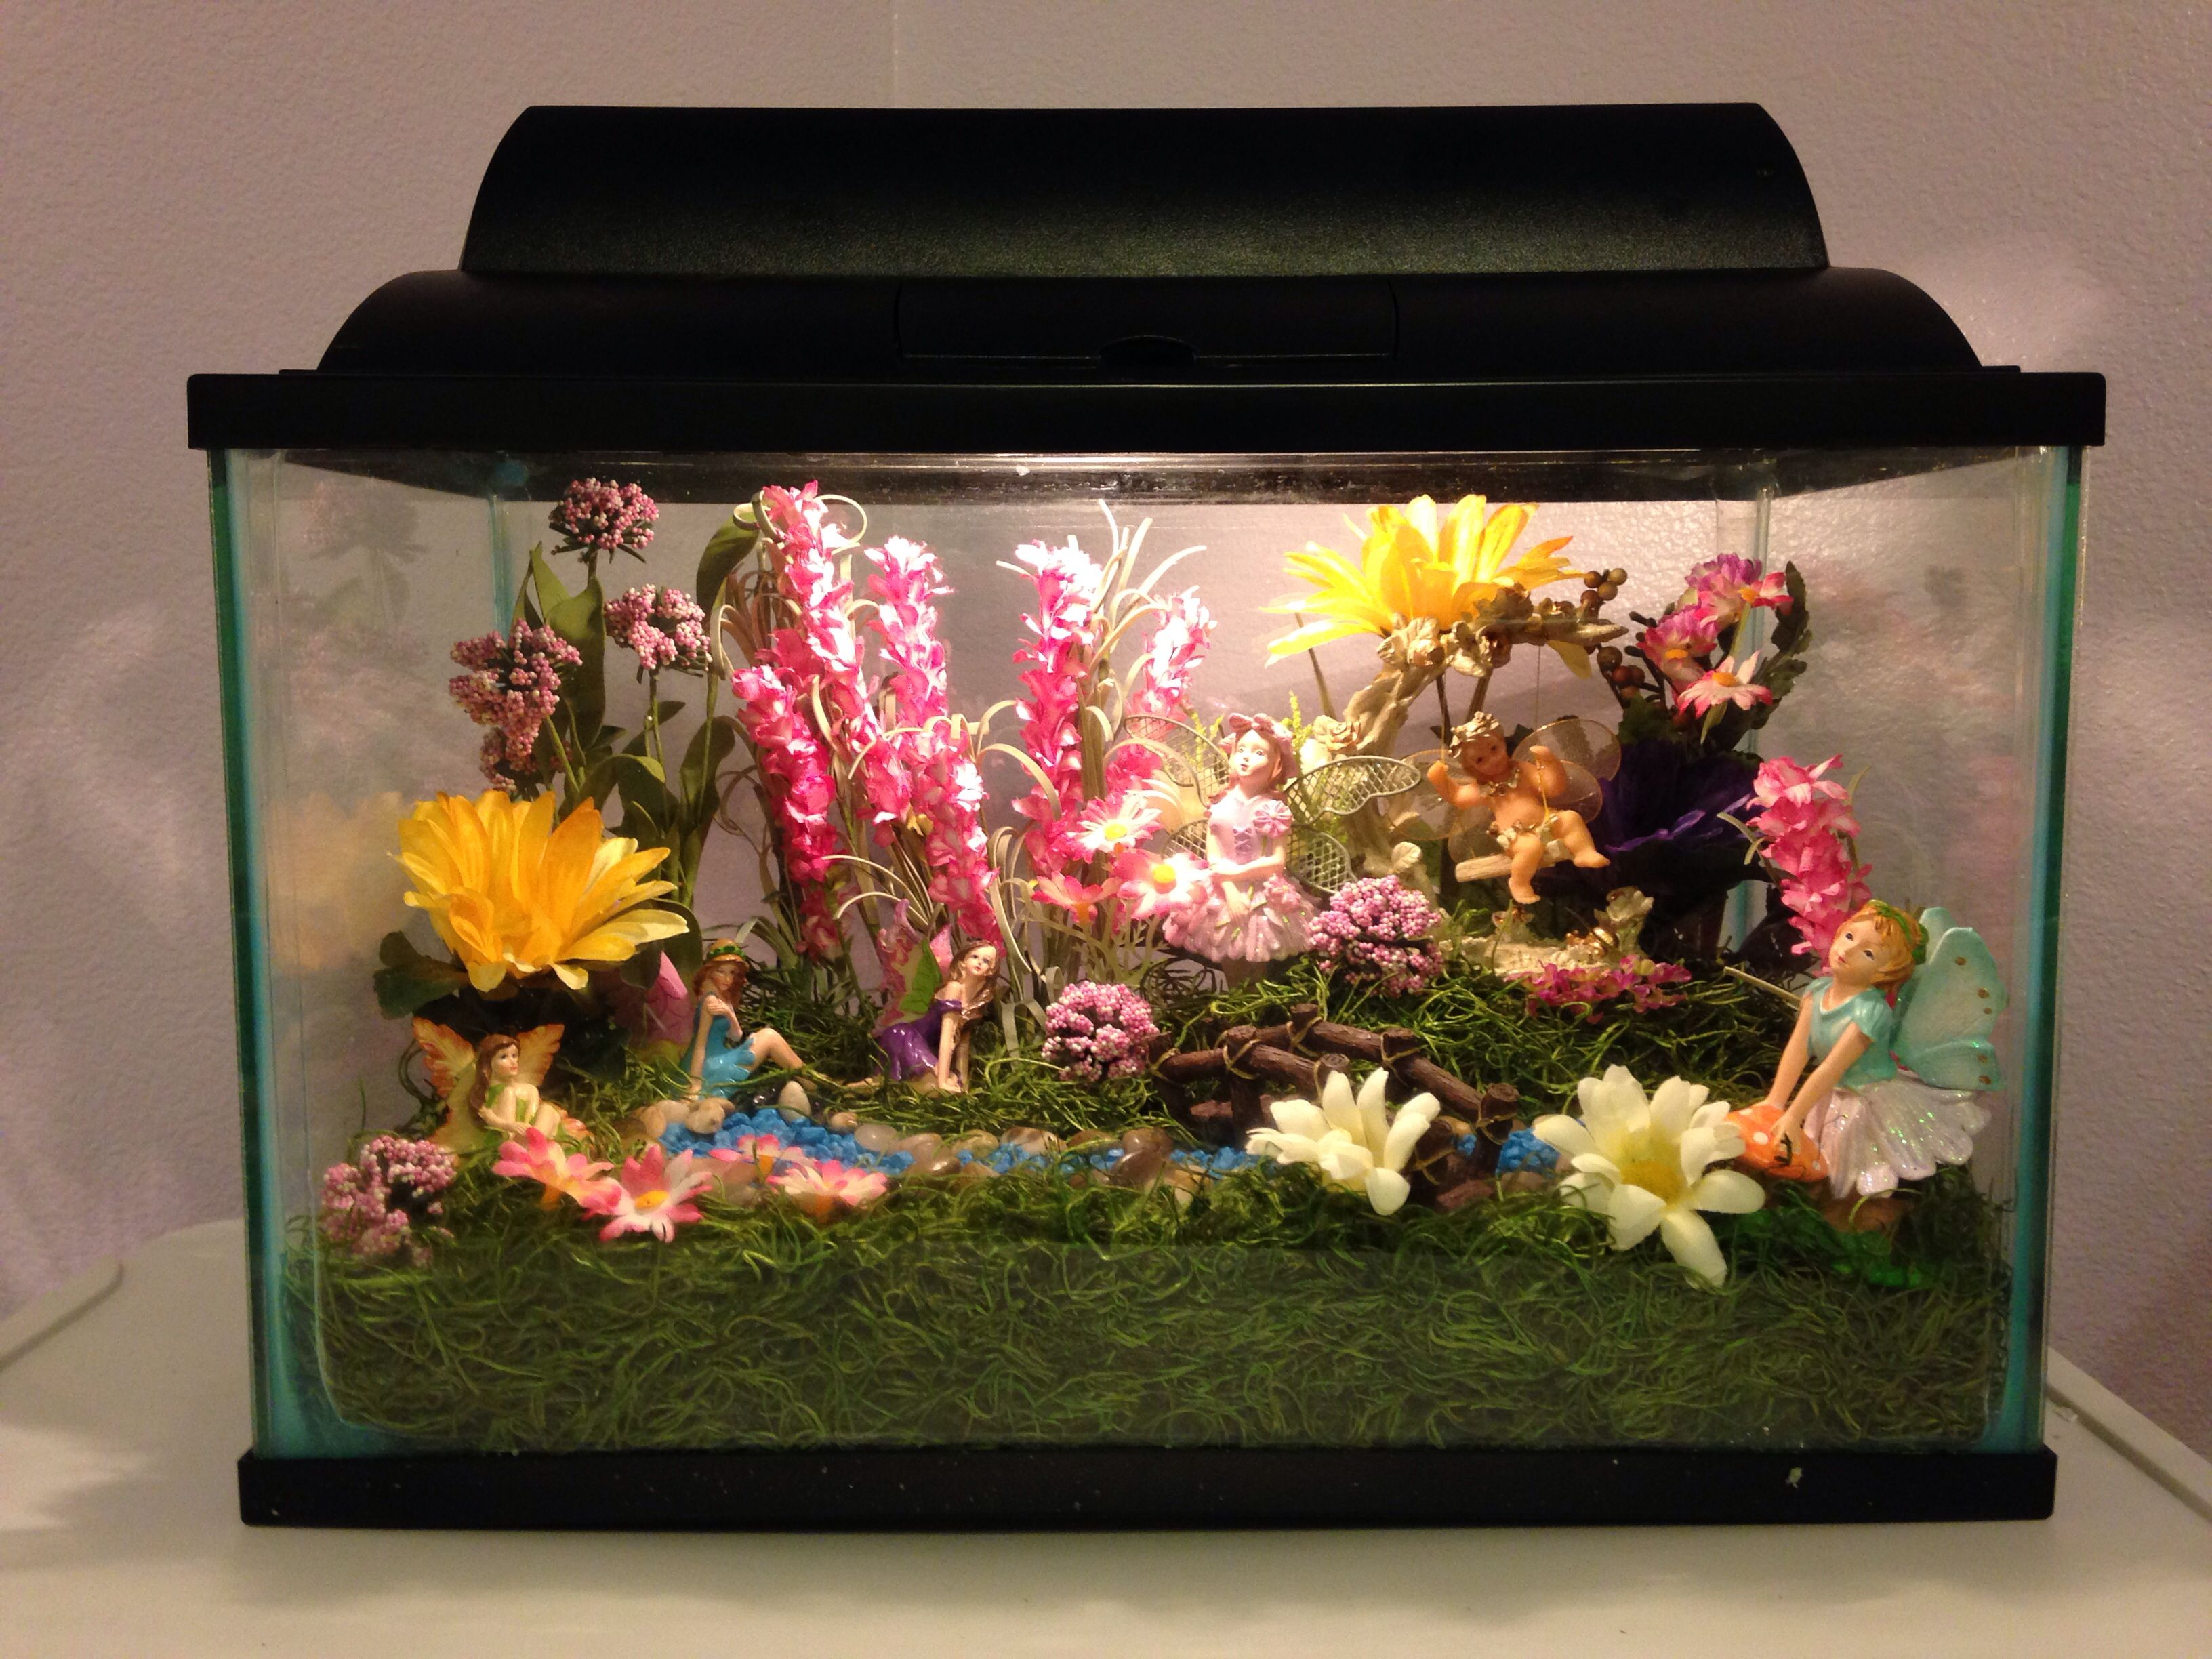 Fairy garden fish tank made as a night light for my for Fish tank garden